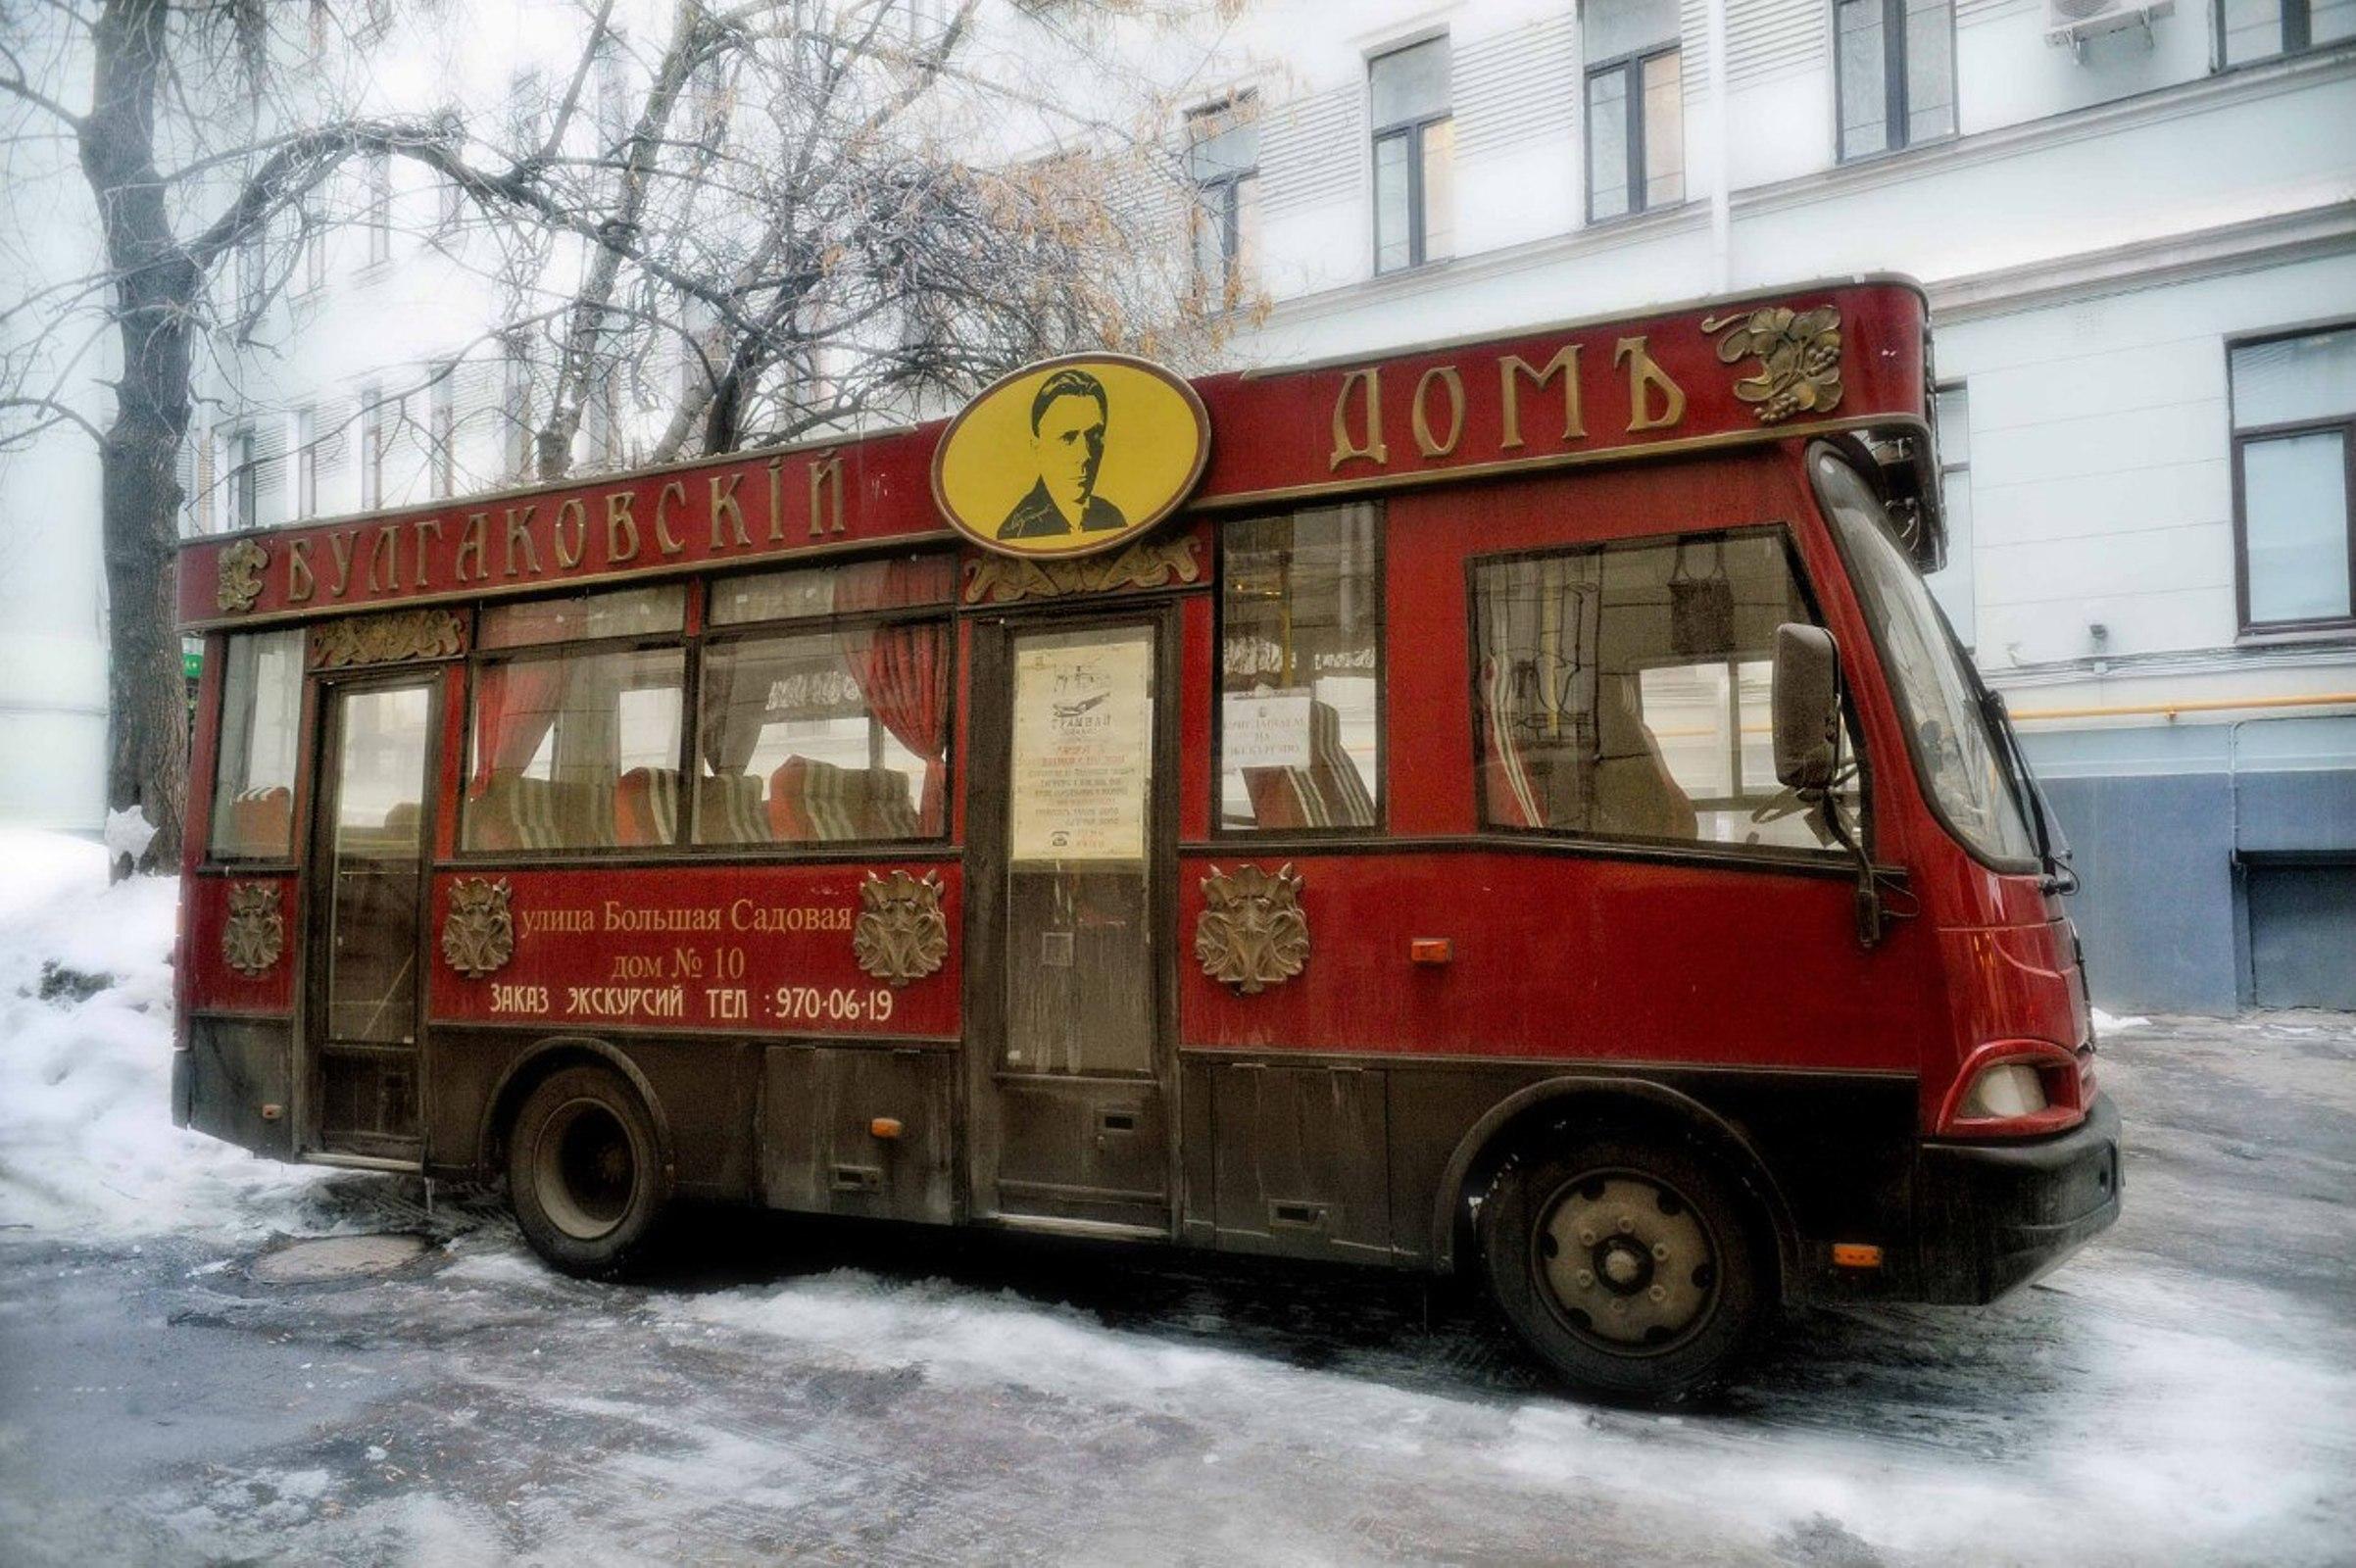 Трамвай во дворе Музея-театра «Булгаковский дом»